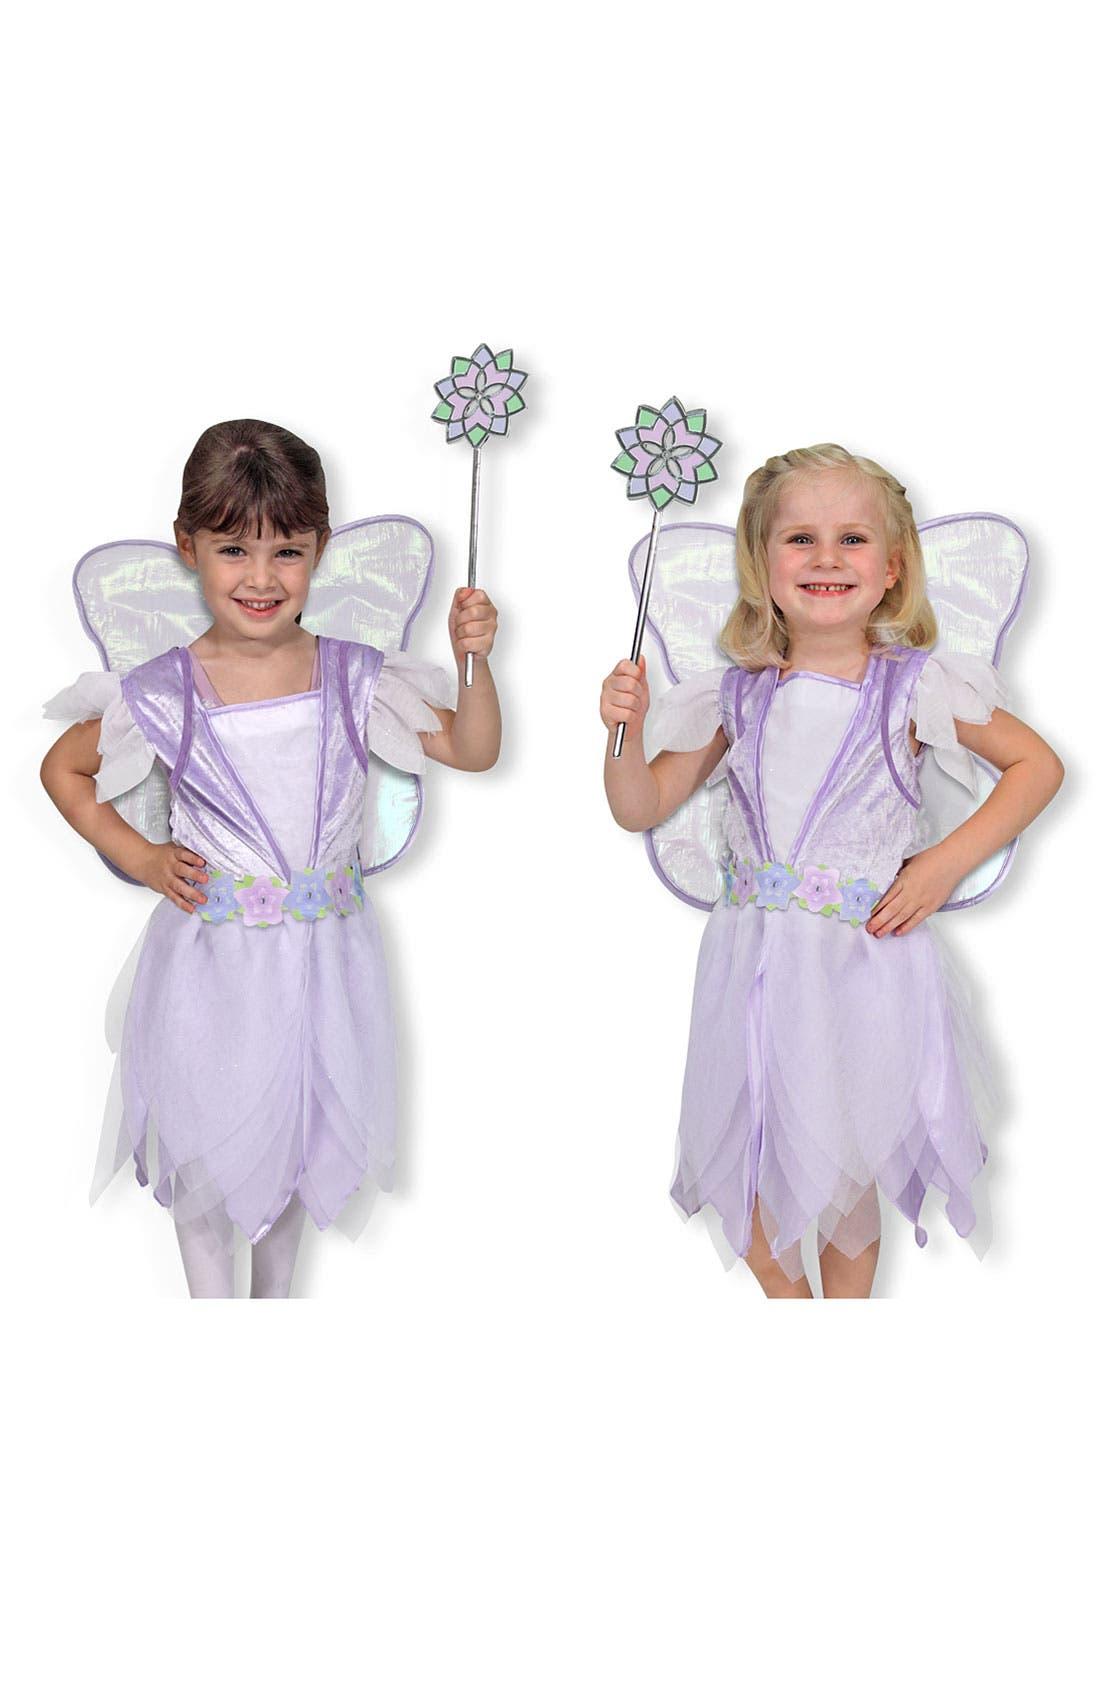 'Fairy' Costume, Main, color, 960